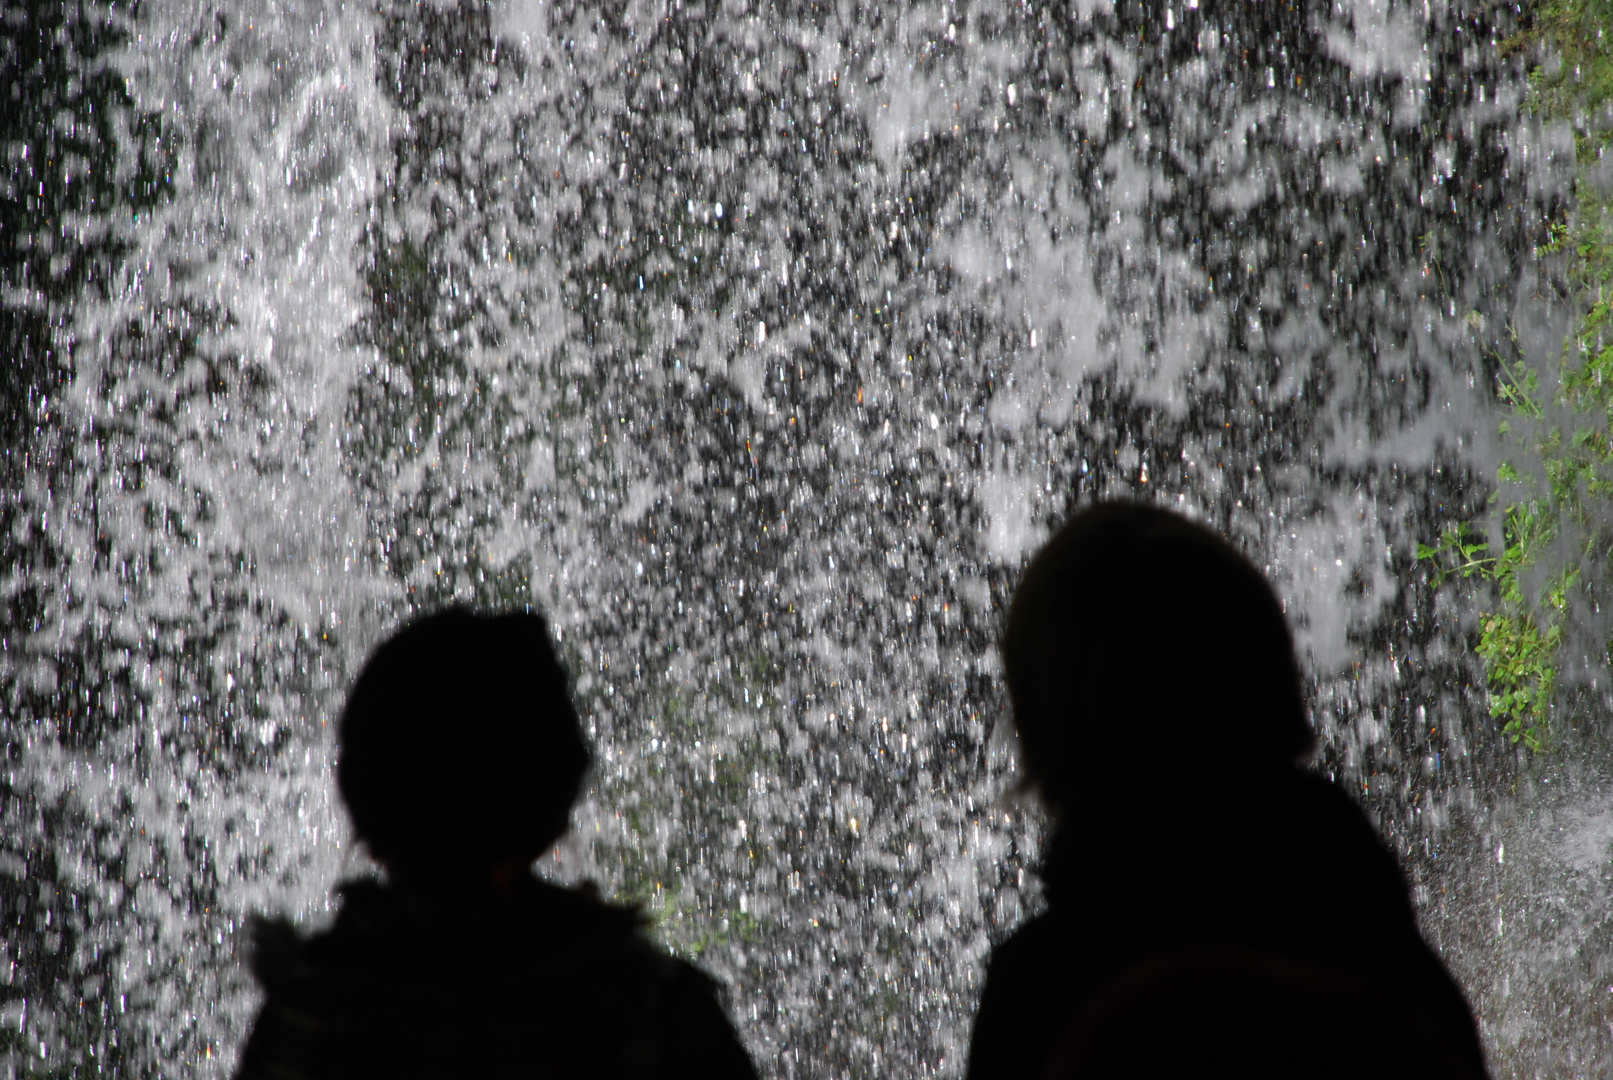 ...unterm Wasserfall...